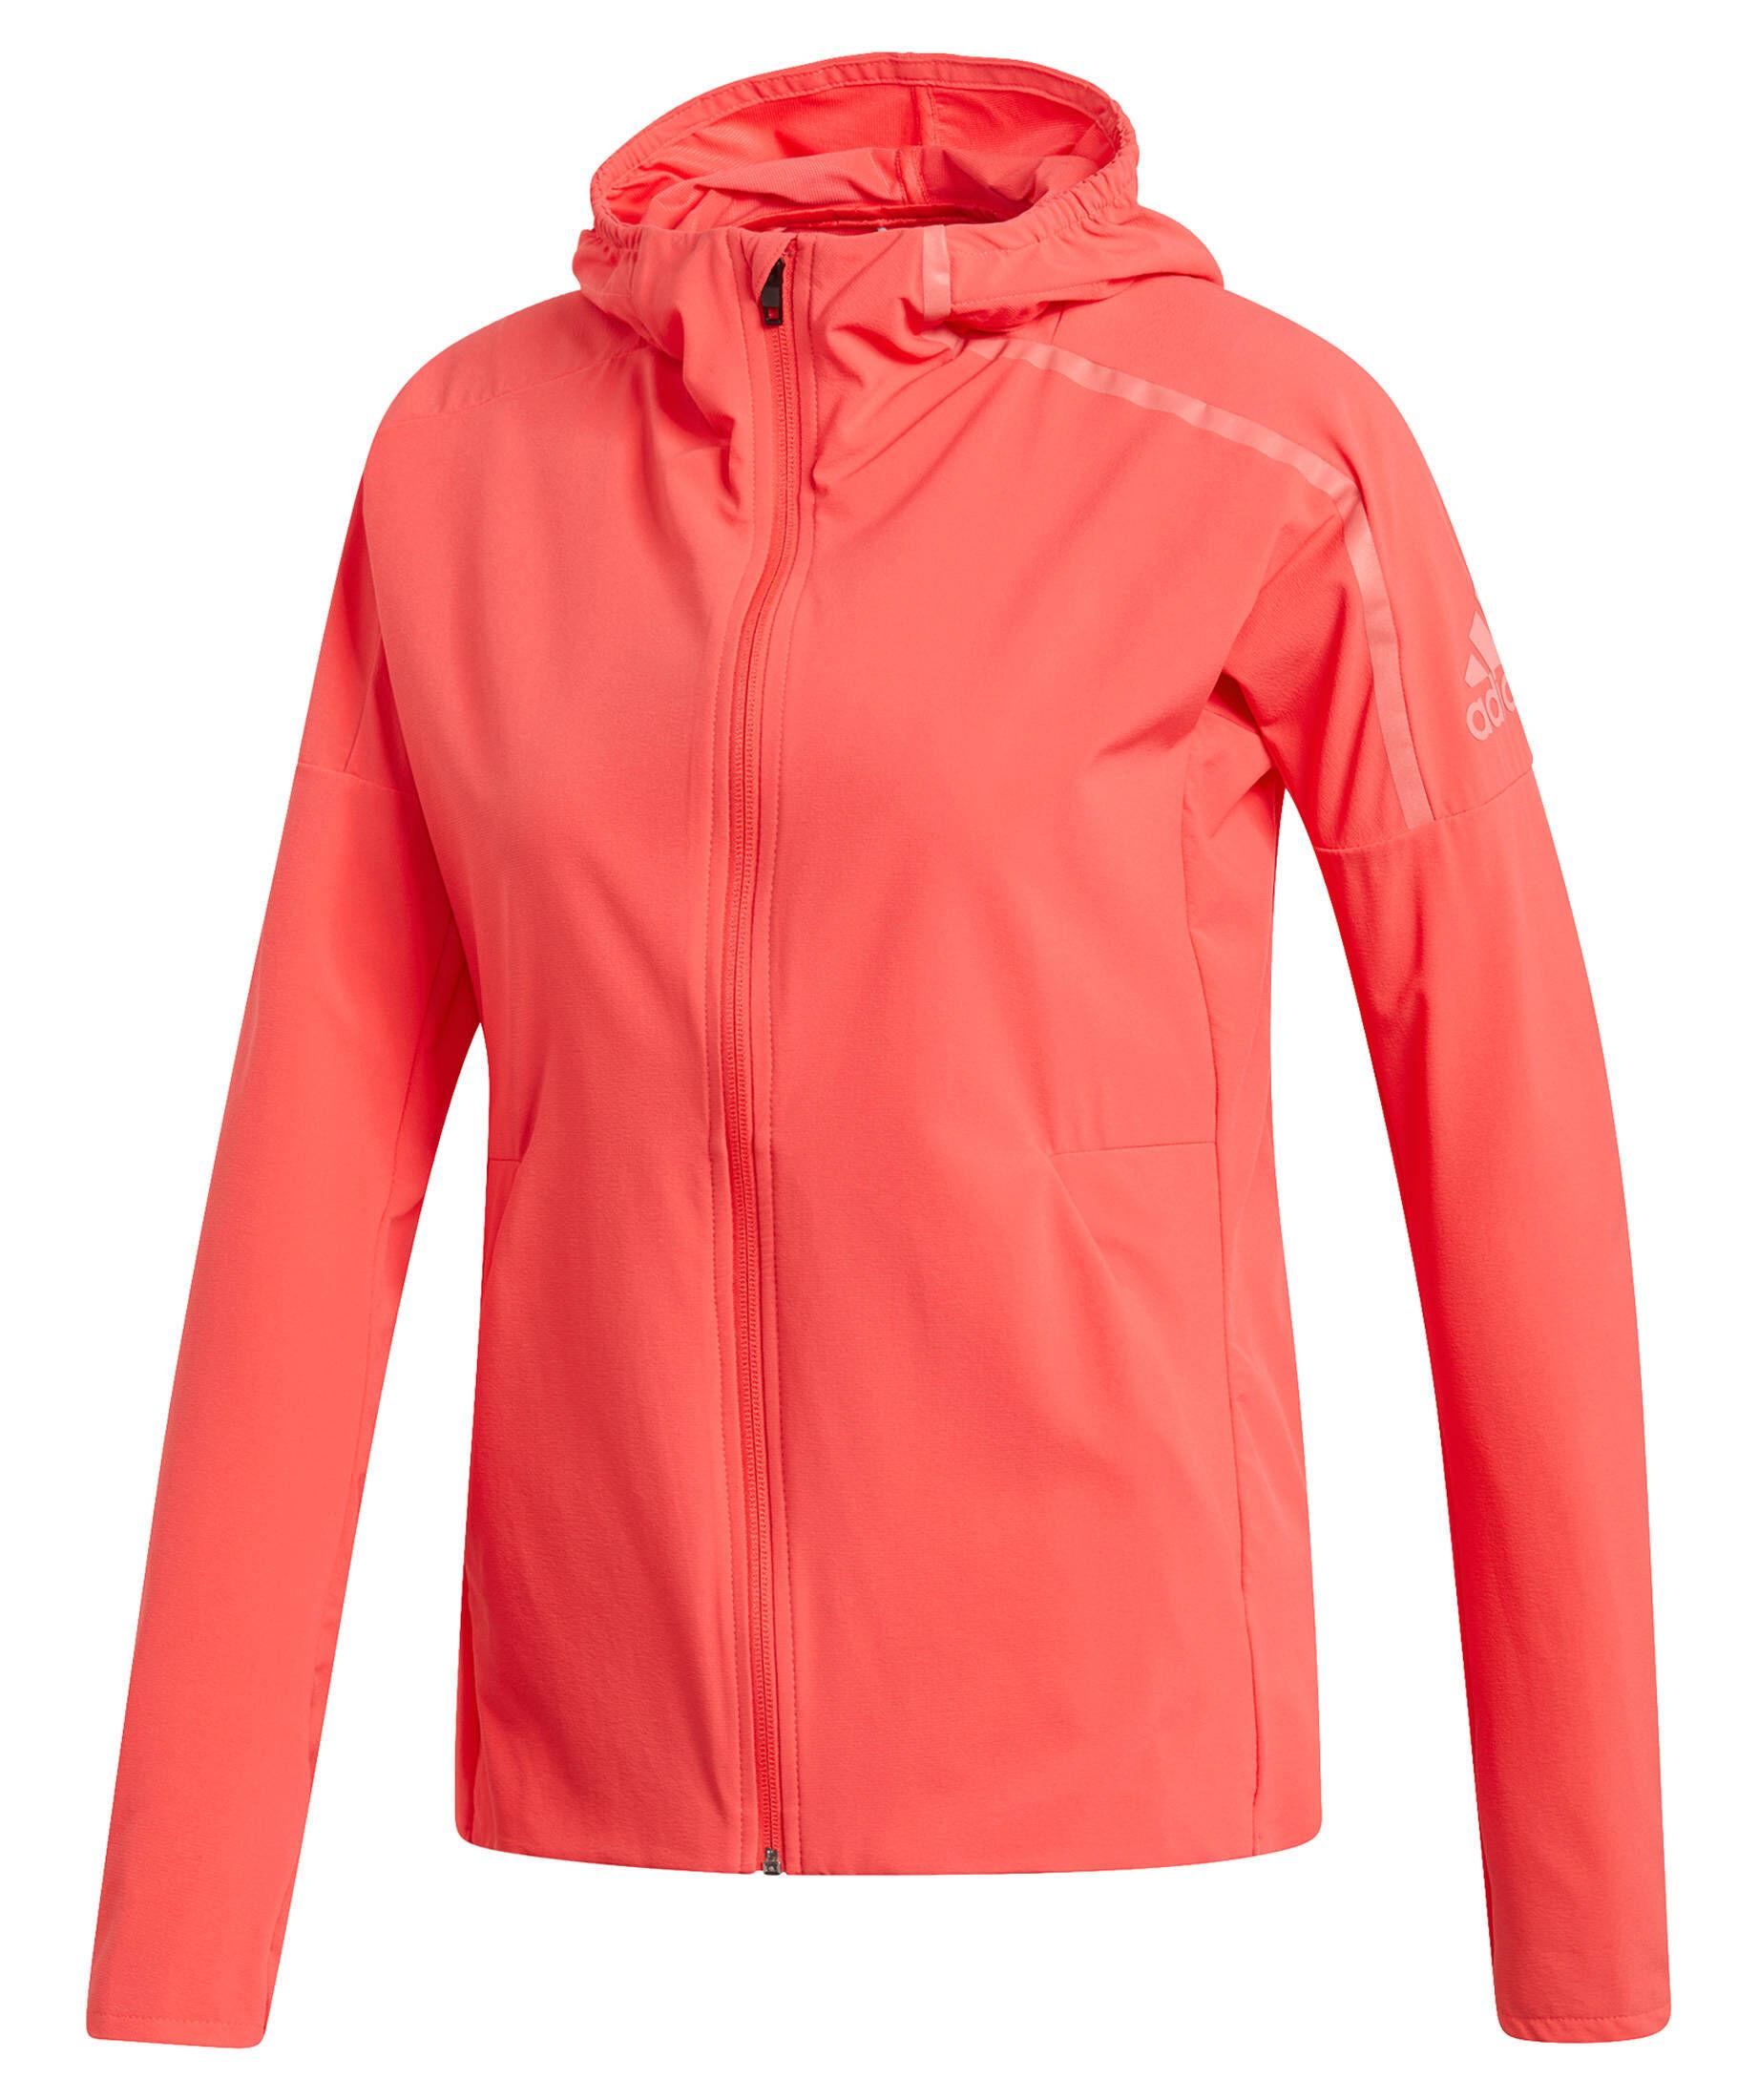 Damen Xl Performance Blau Running Trainingsjacke Adidas Jacken q5L34AjR